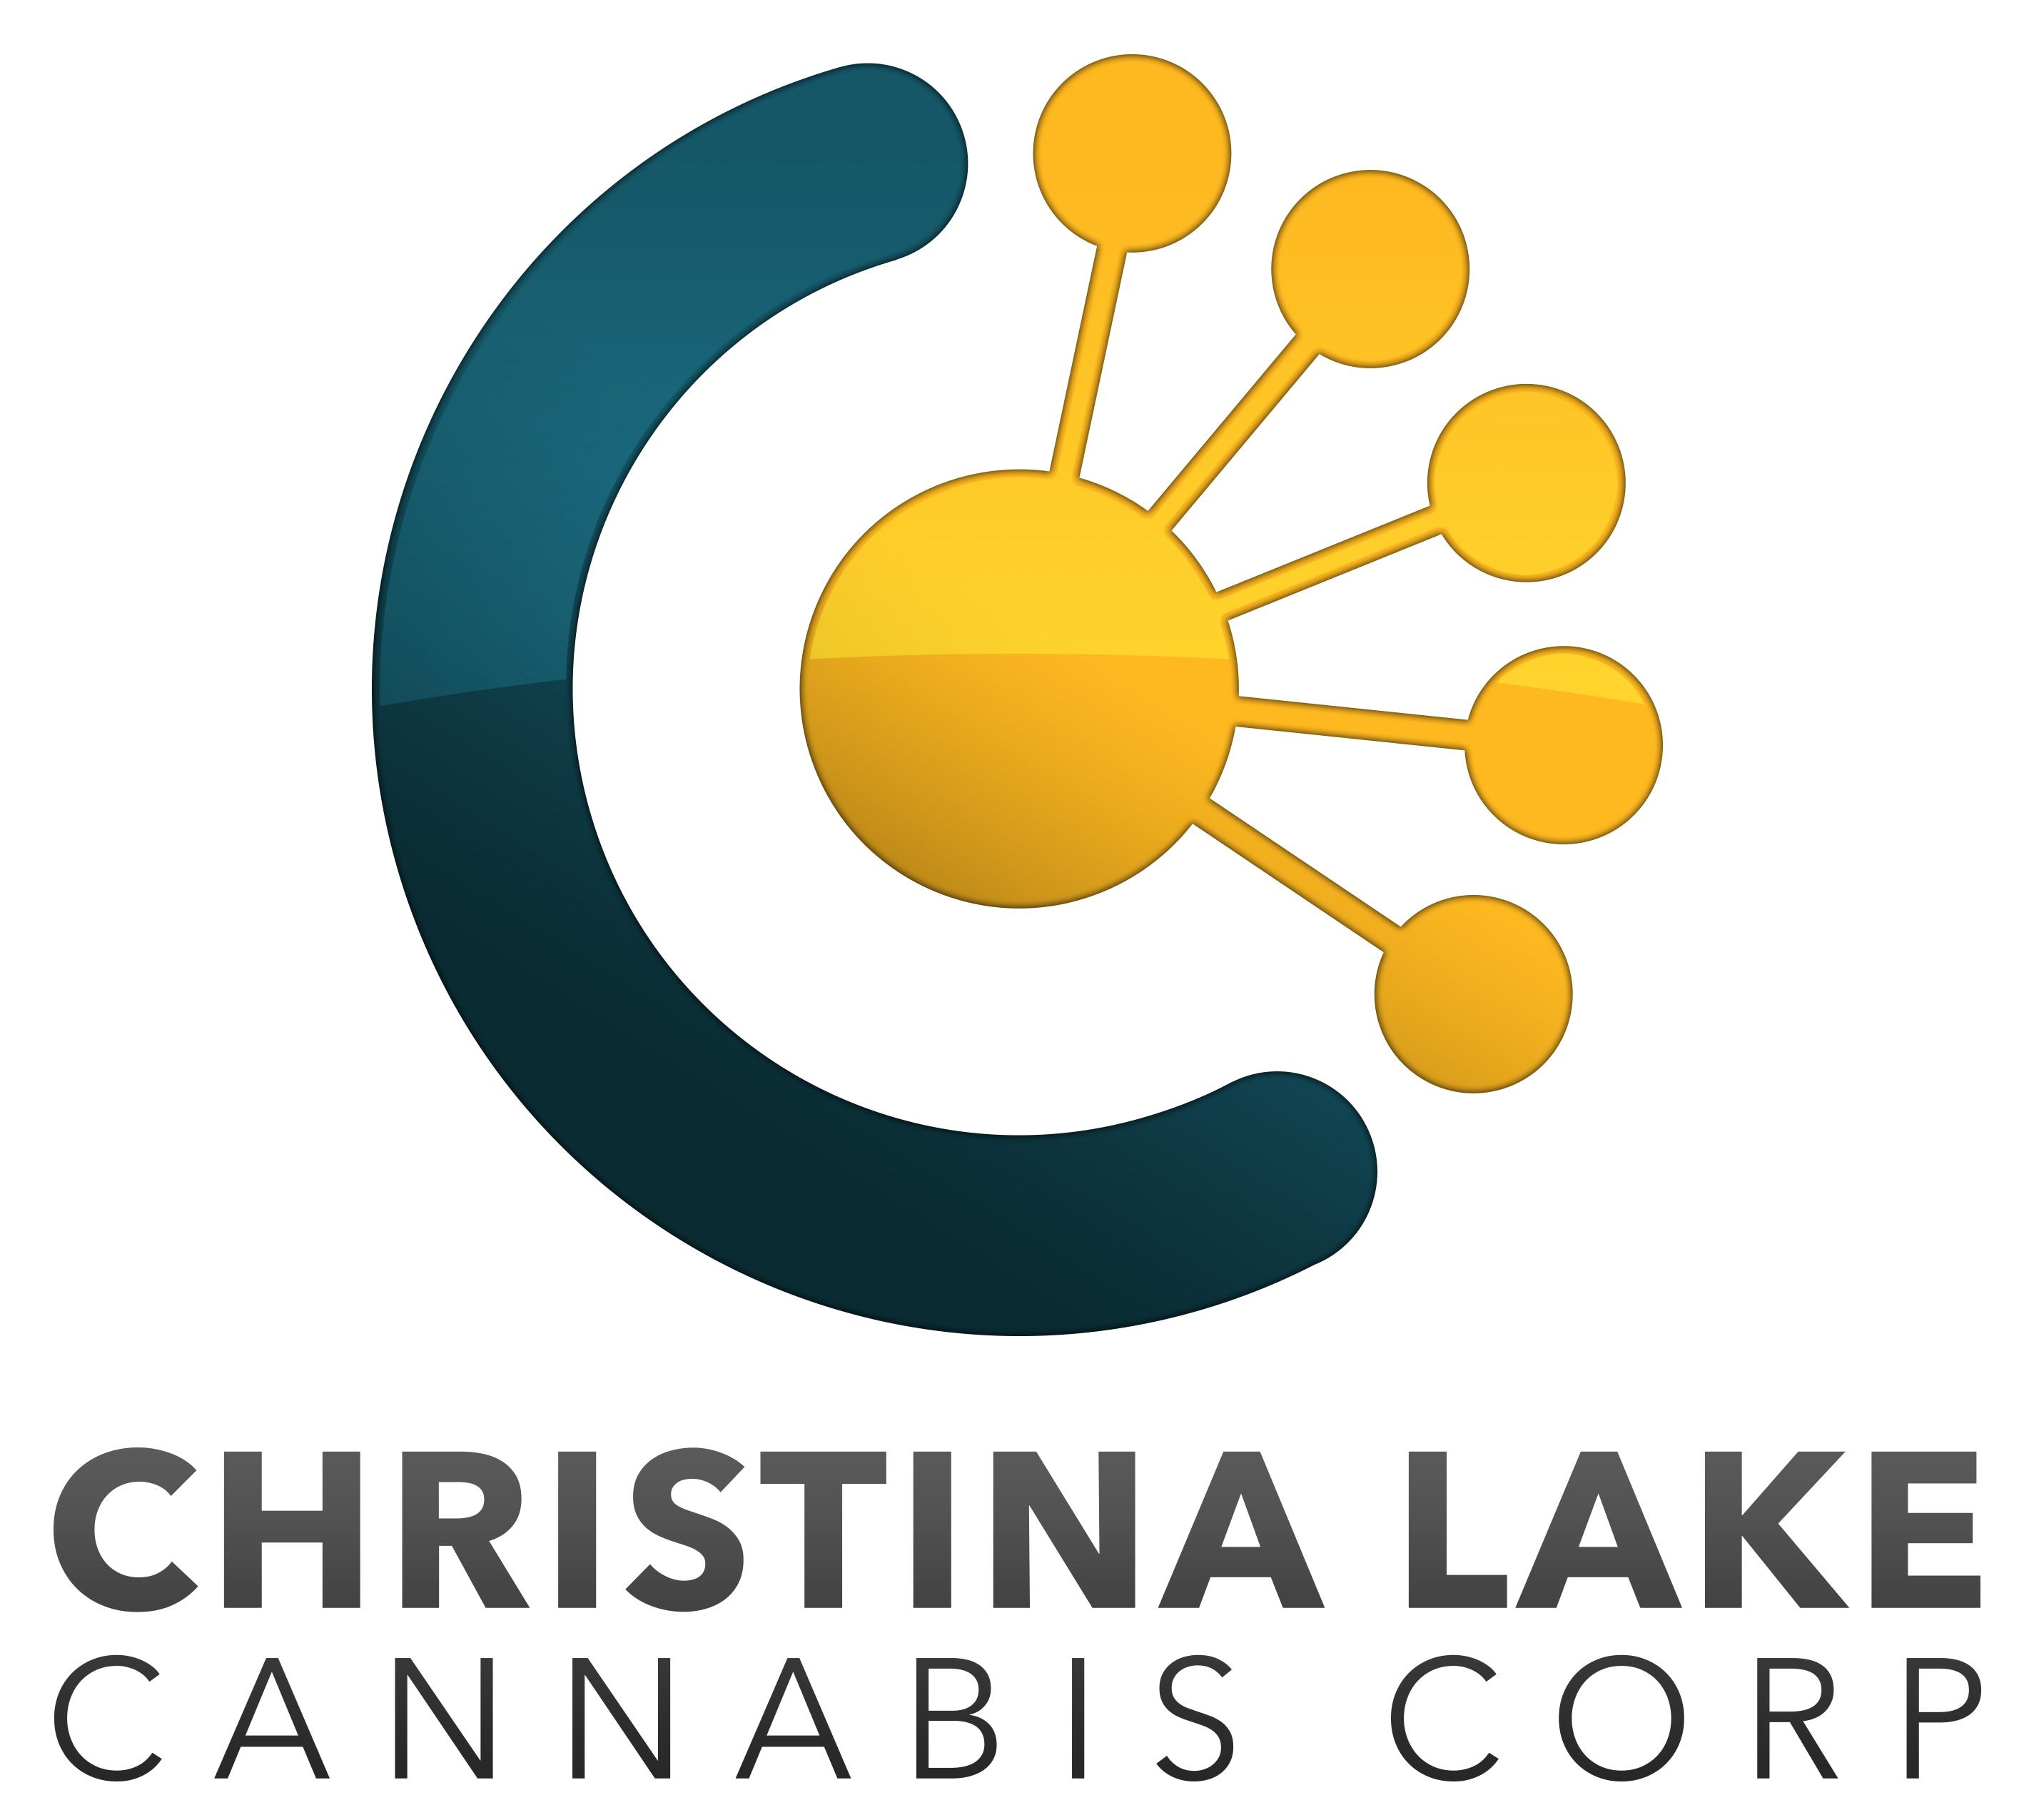 Christina Lake Cannabis Announces Uplisting to OTCQB® Market in the United States